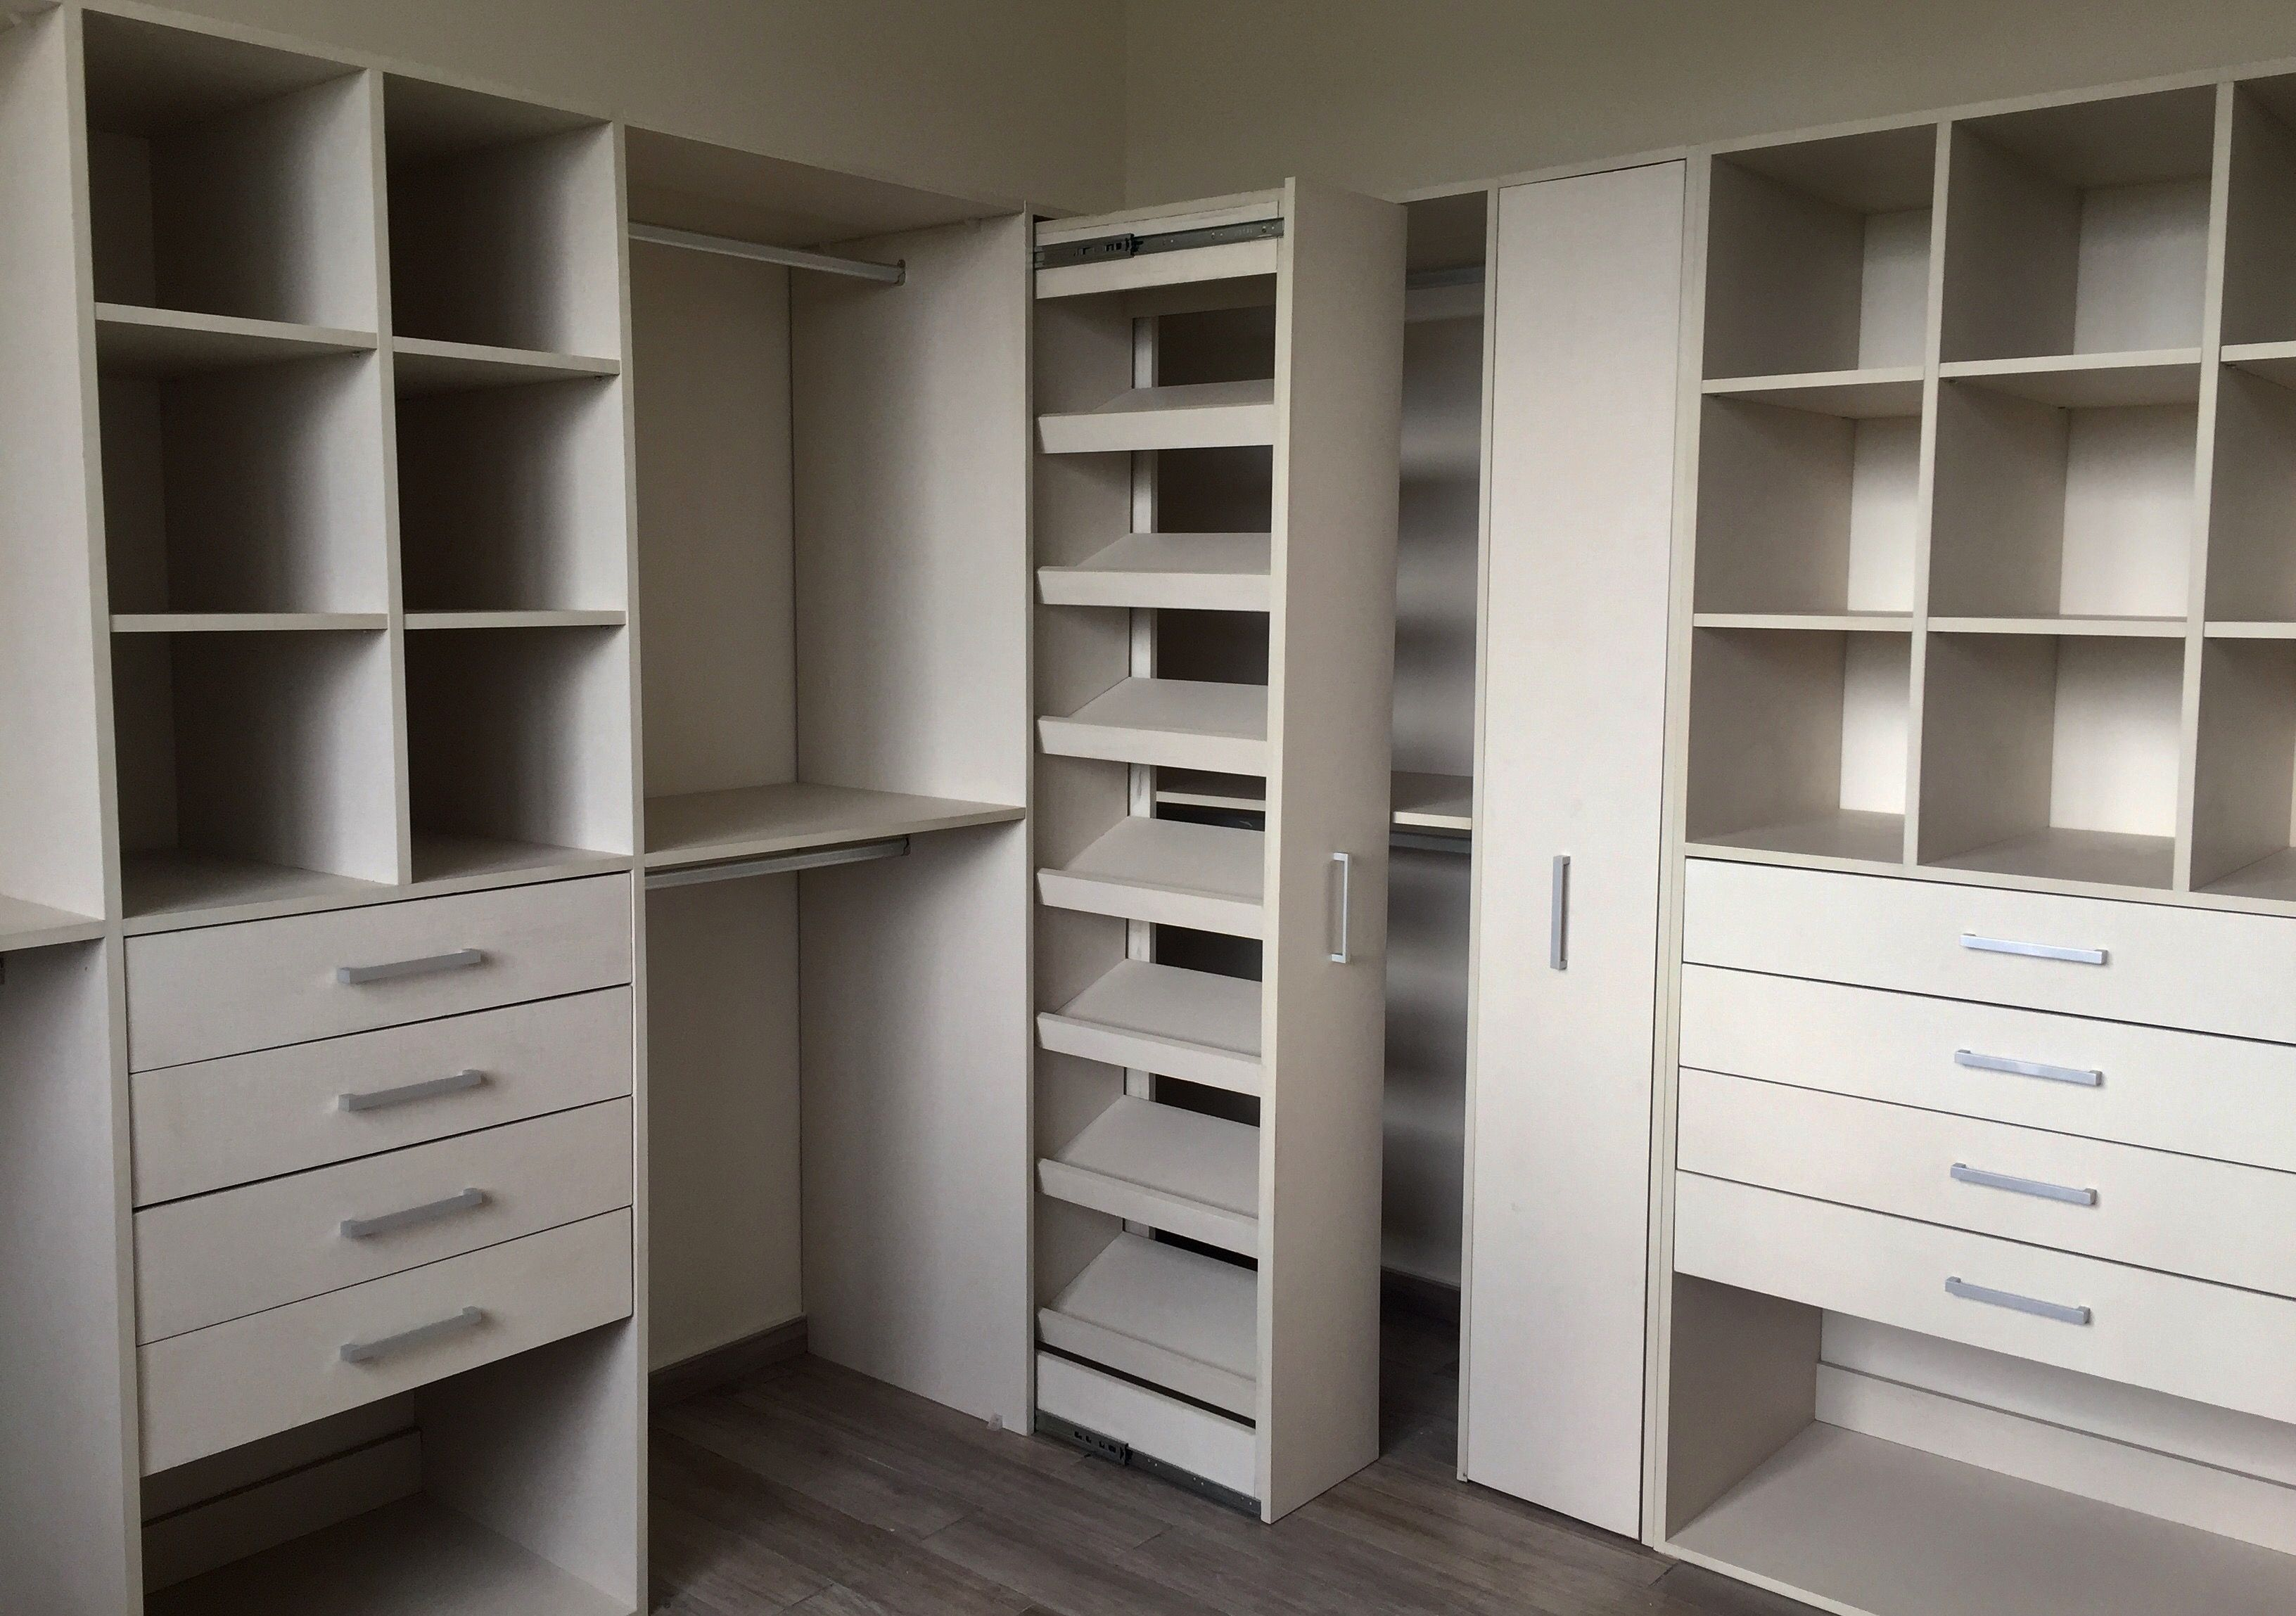 Img 1274 Jpg 3 264 2 298 Píxeles Diseño De Armario Para Dormitorio Diseño De Armario Diseño De Closet